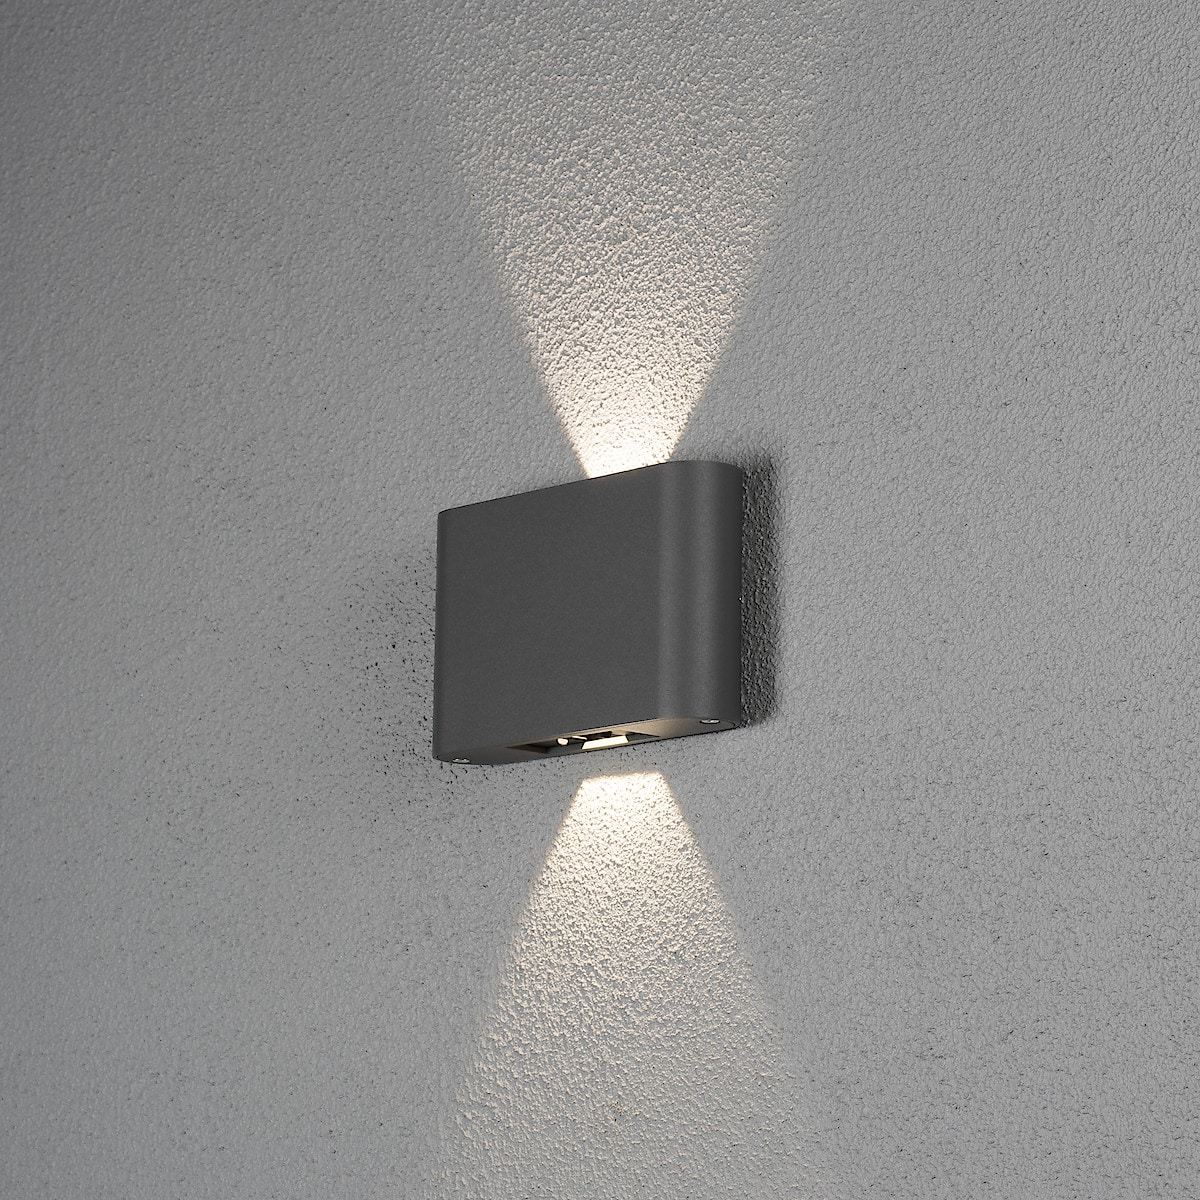 Konstsmide Chieri LED Wall Light